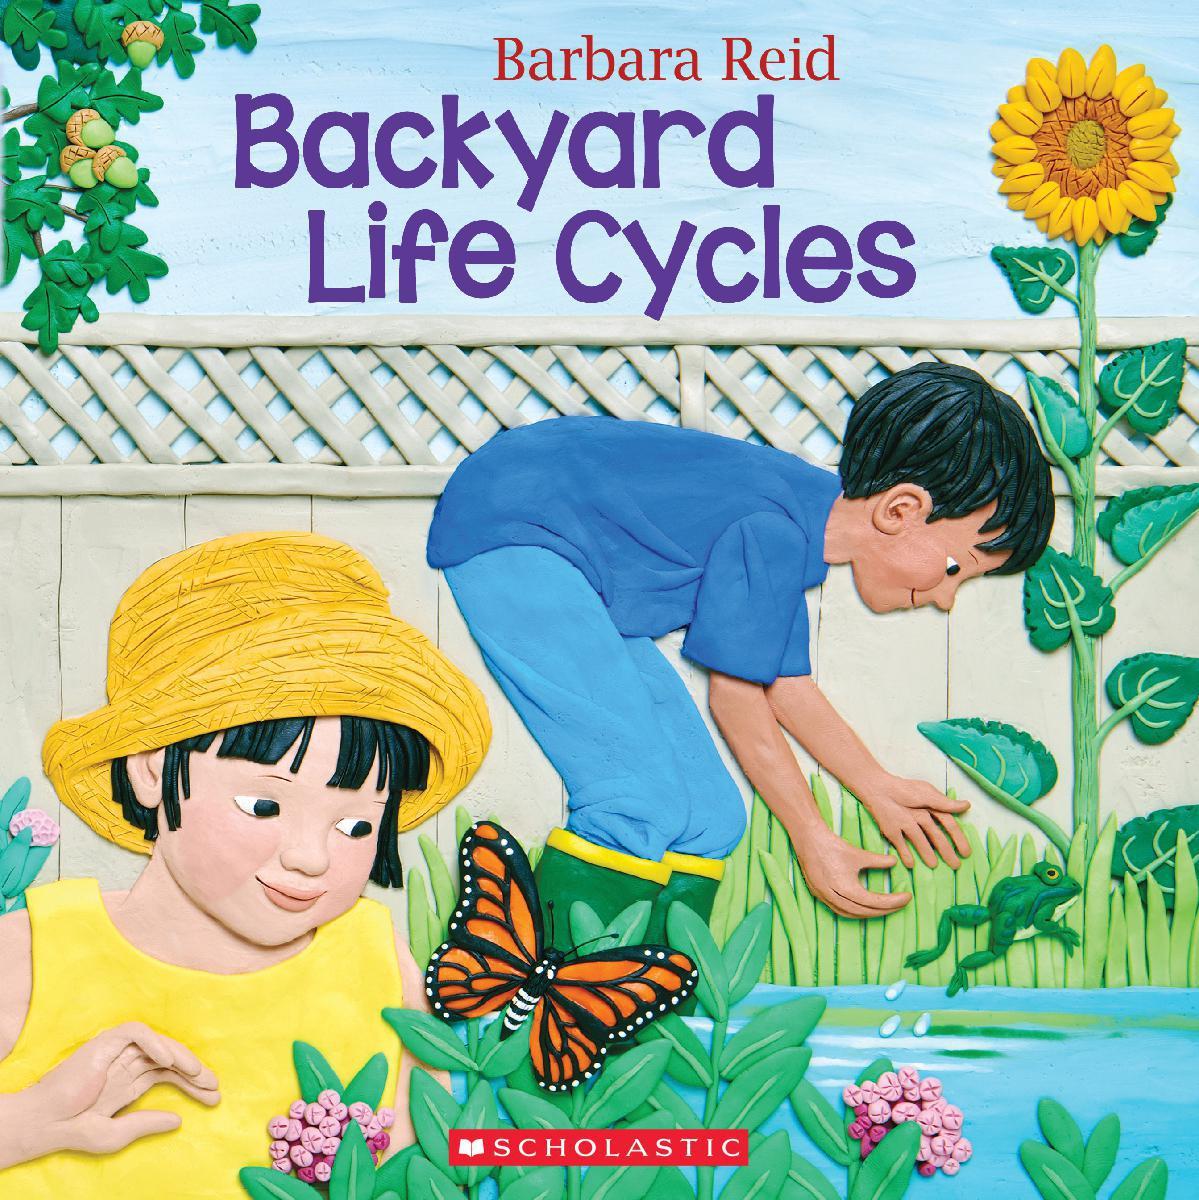 Backyard Life Cycles